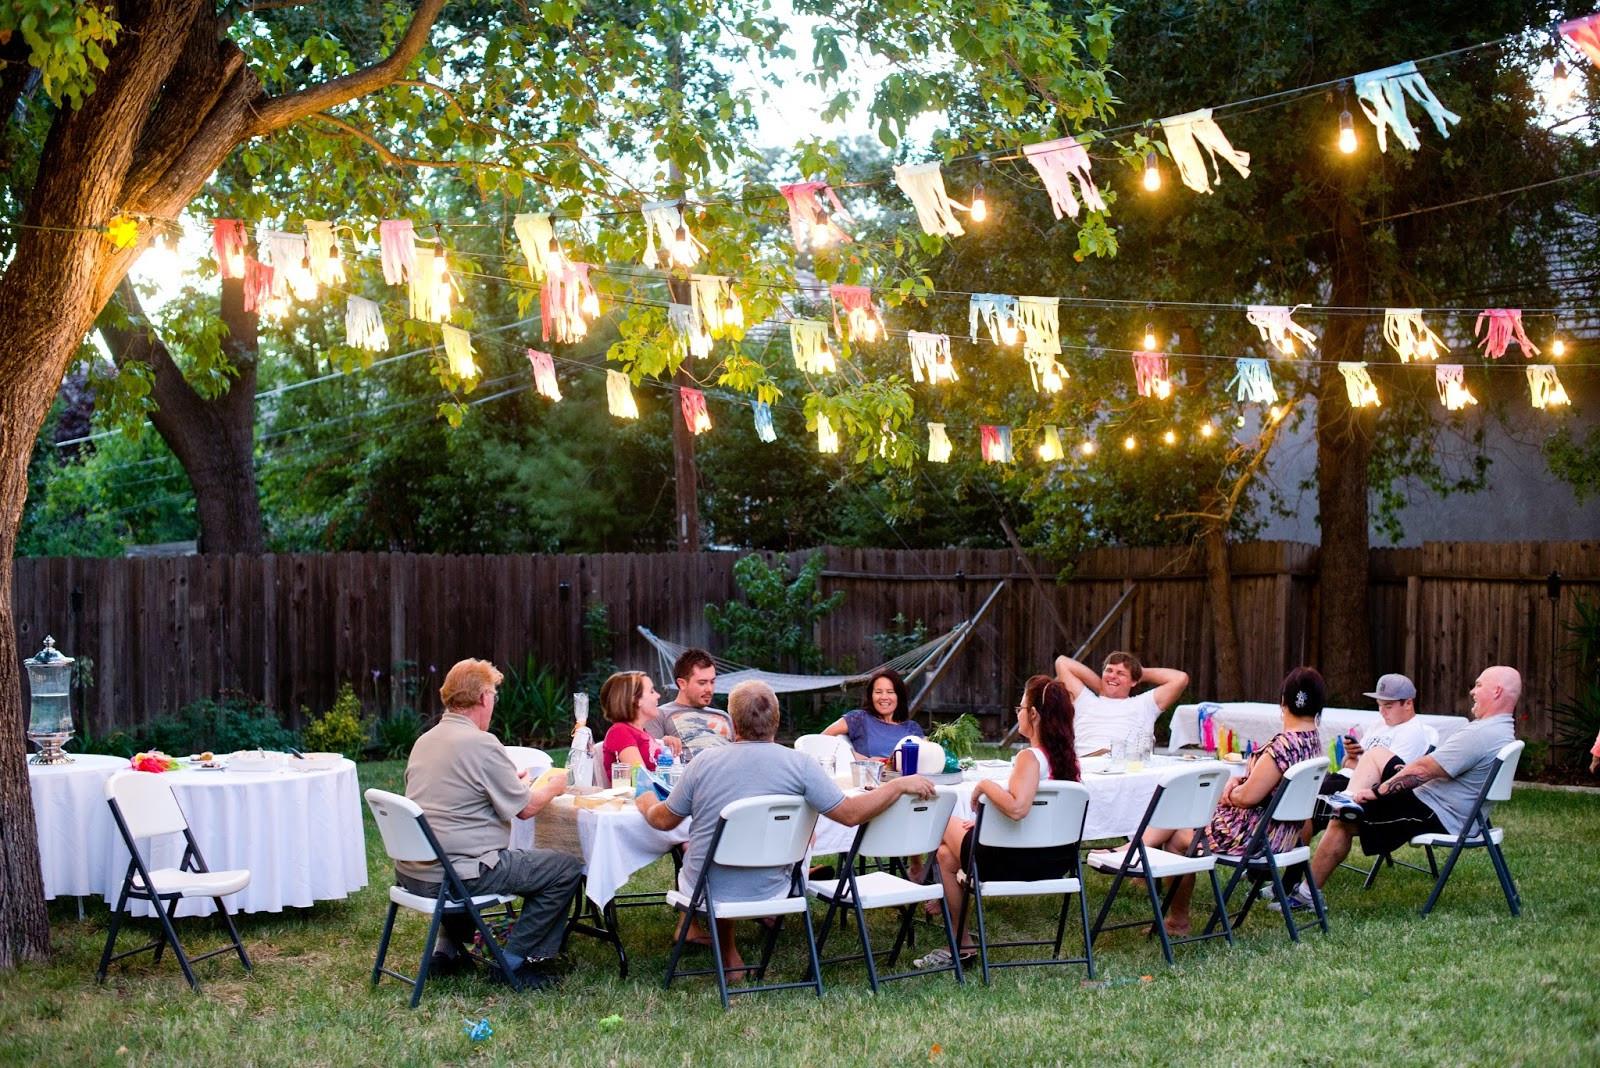 Party In Backyard Ideas  Domestic Fashionista Backyard Fall Celebration